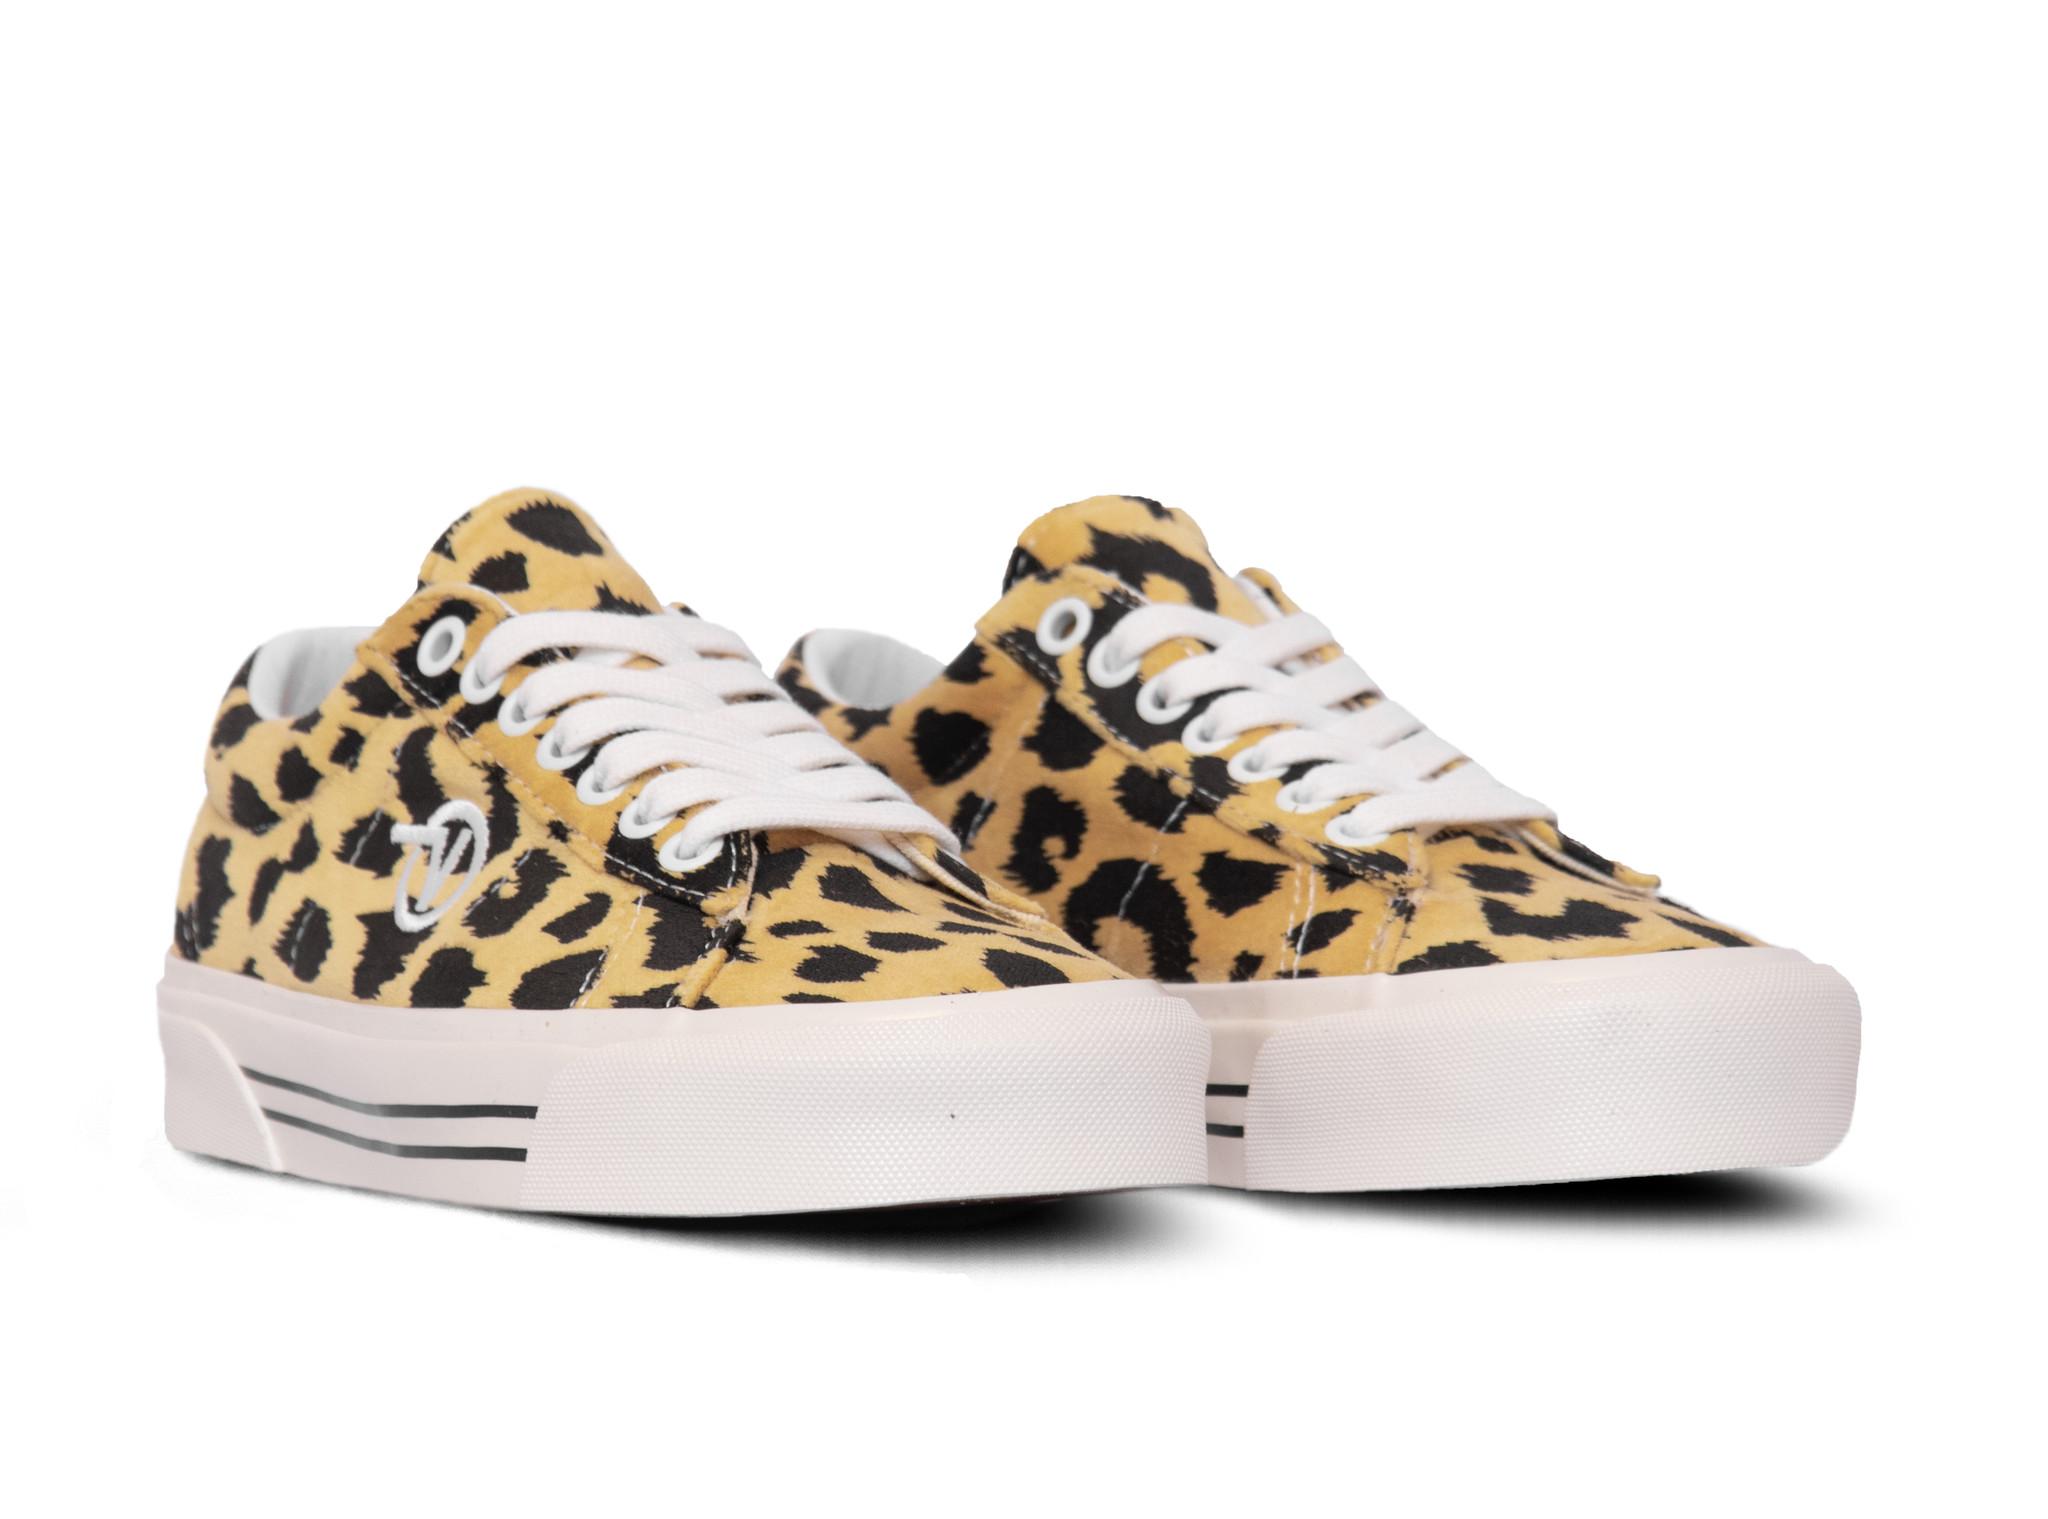 VANS SID DX Anaheim OG Leopard Sneakers Dames